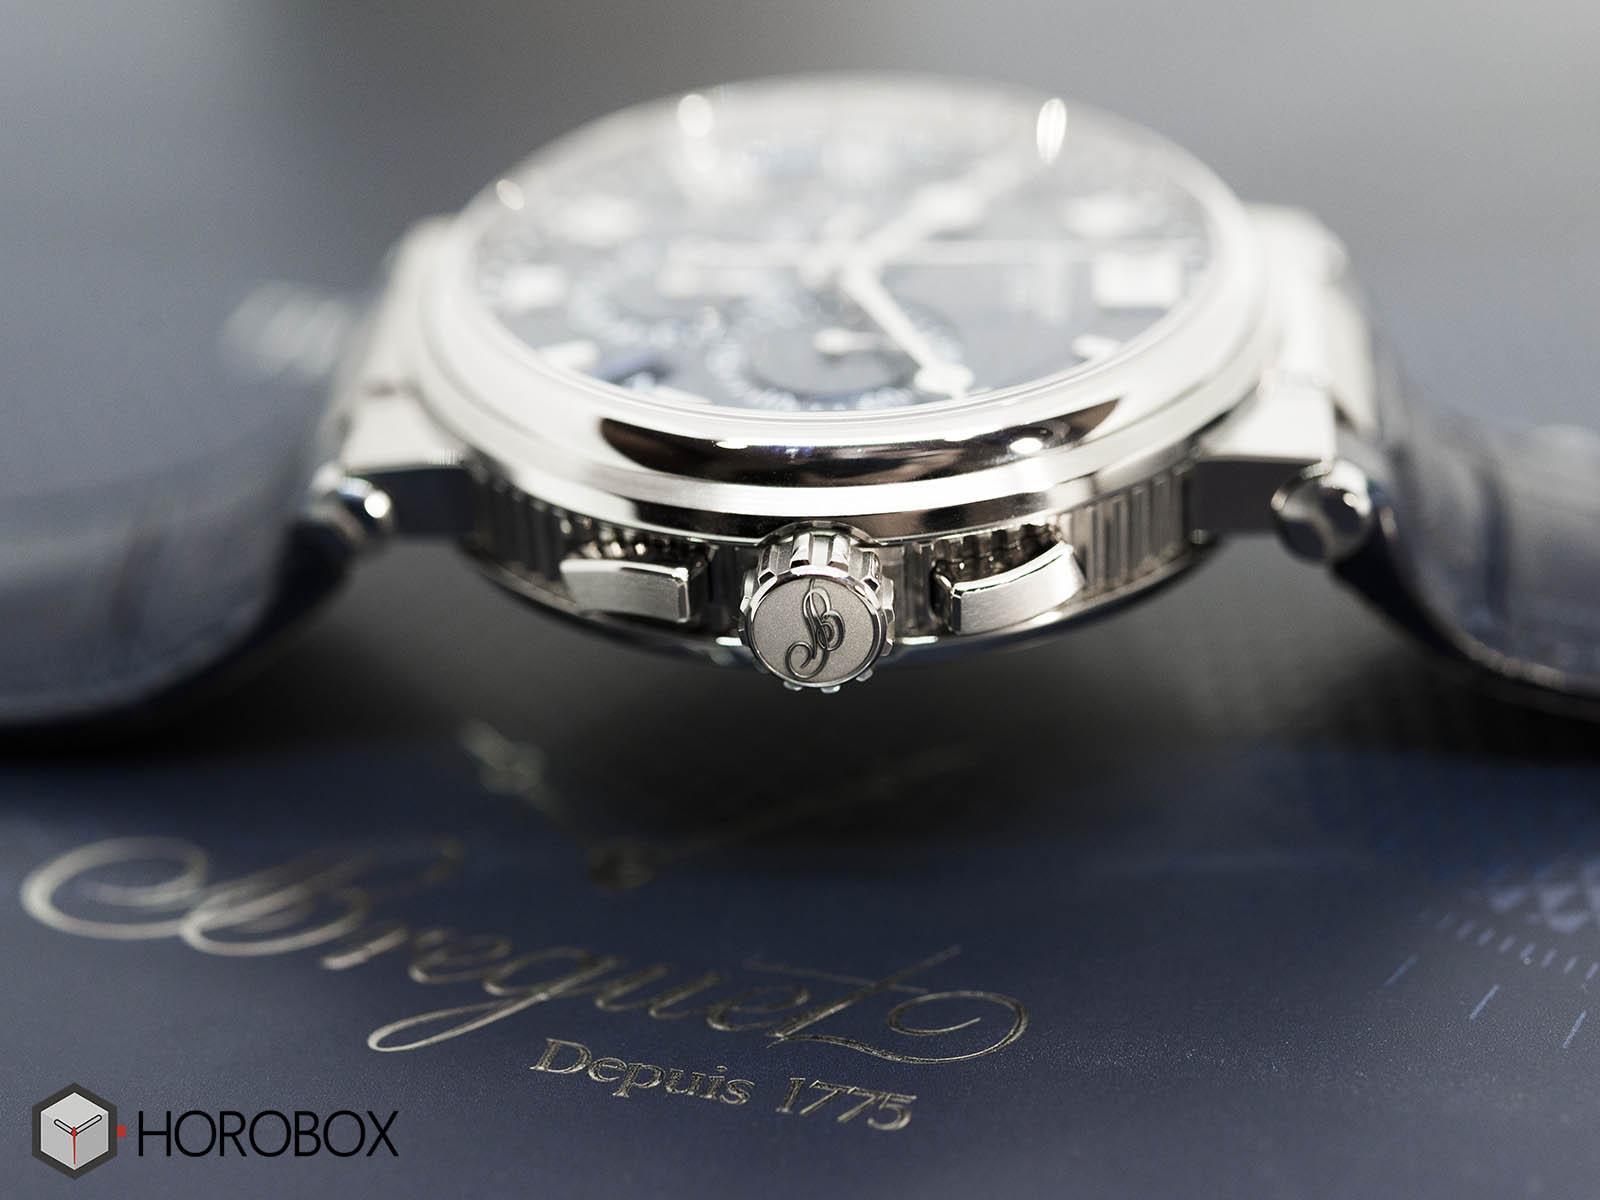 5527-breguet-marine-chronograph-5.jpg